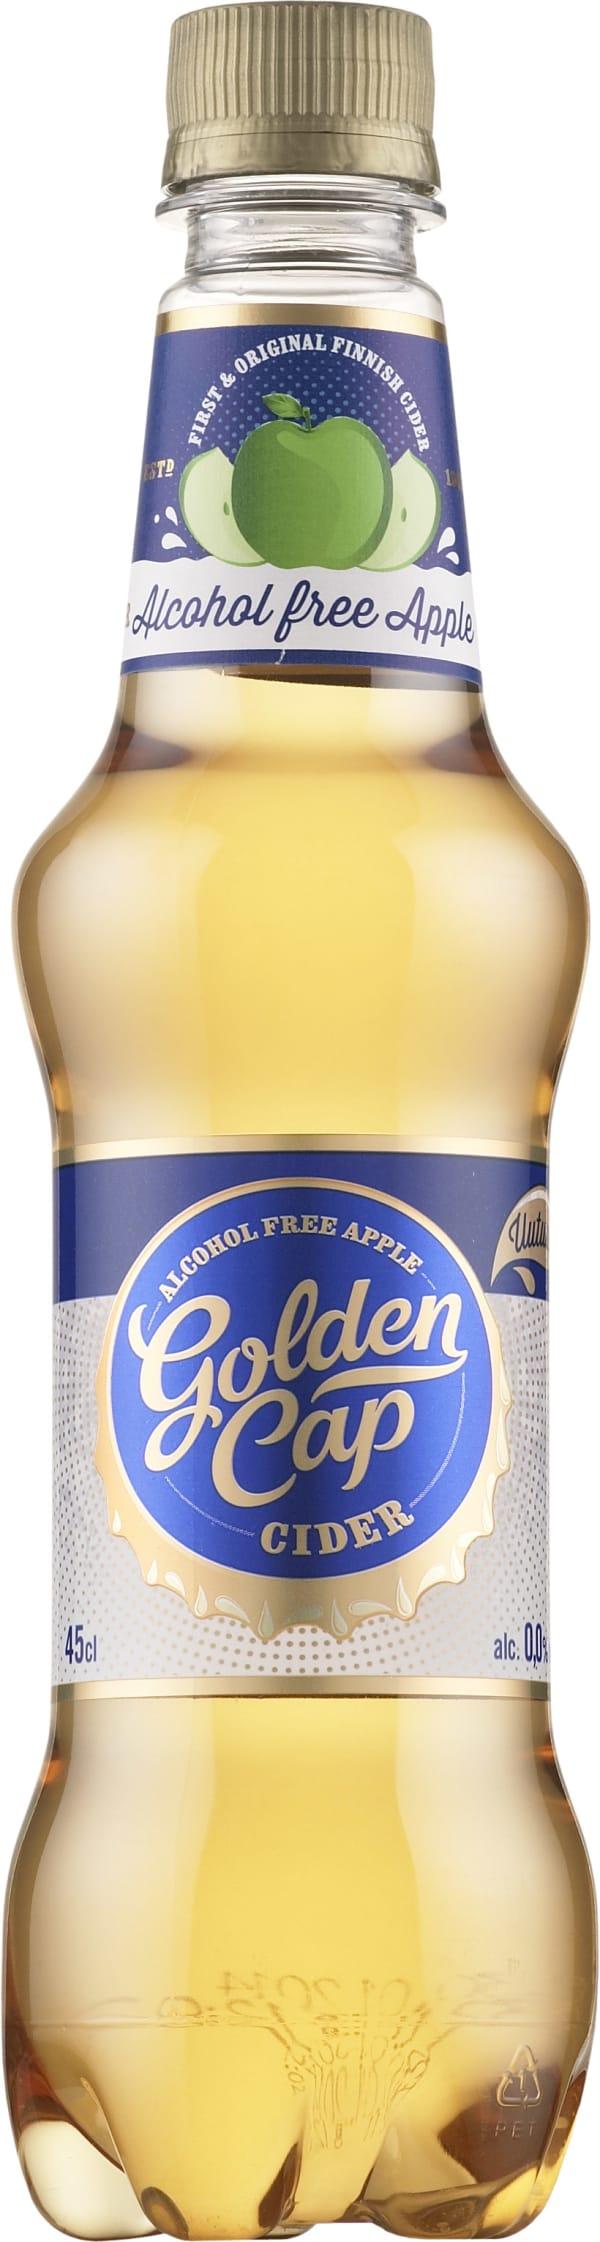 Golden Cap Alcohol Free Apple Cider  plastic bottle